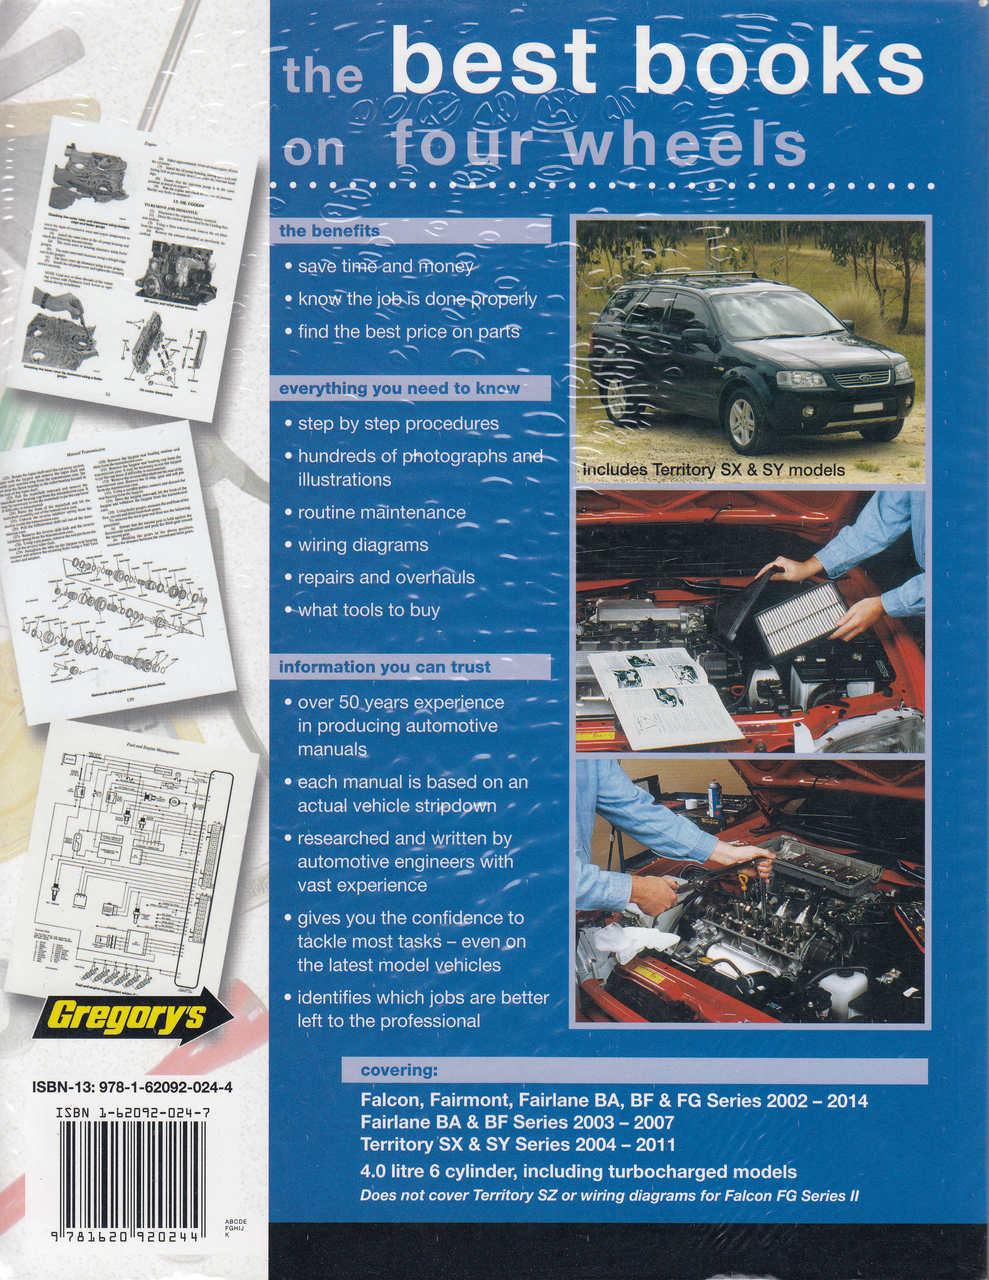 Ford Falcon, Fairmont, Fairlane BA BF FG Territory SX SY 2002 - 2014 Workshop  Manual